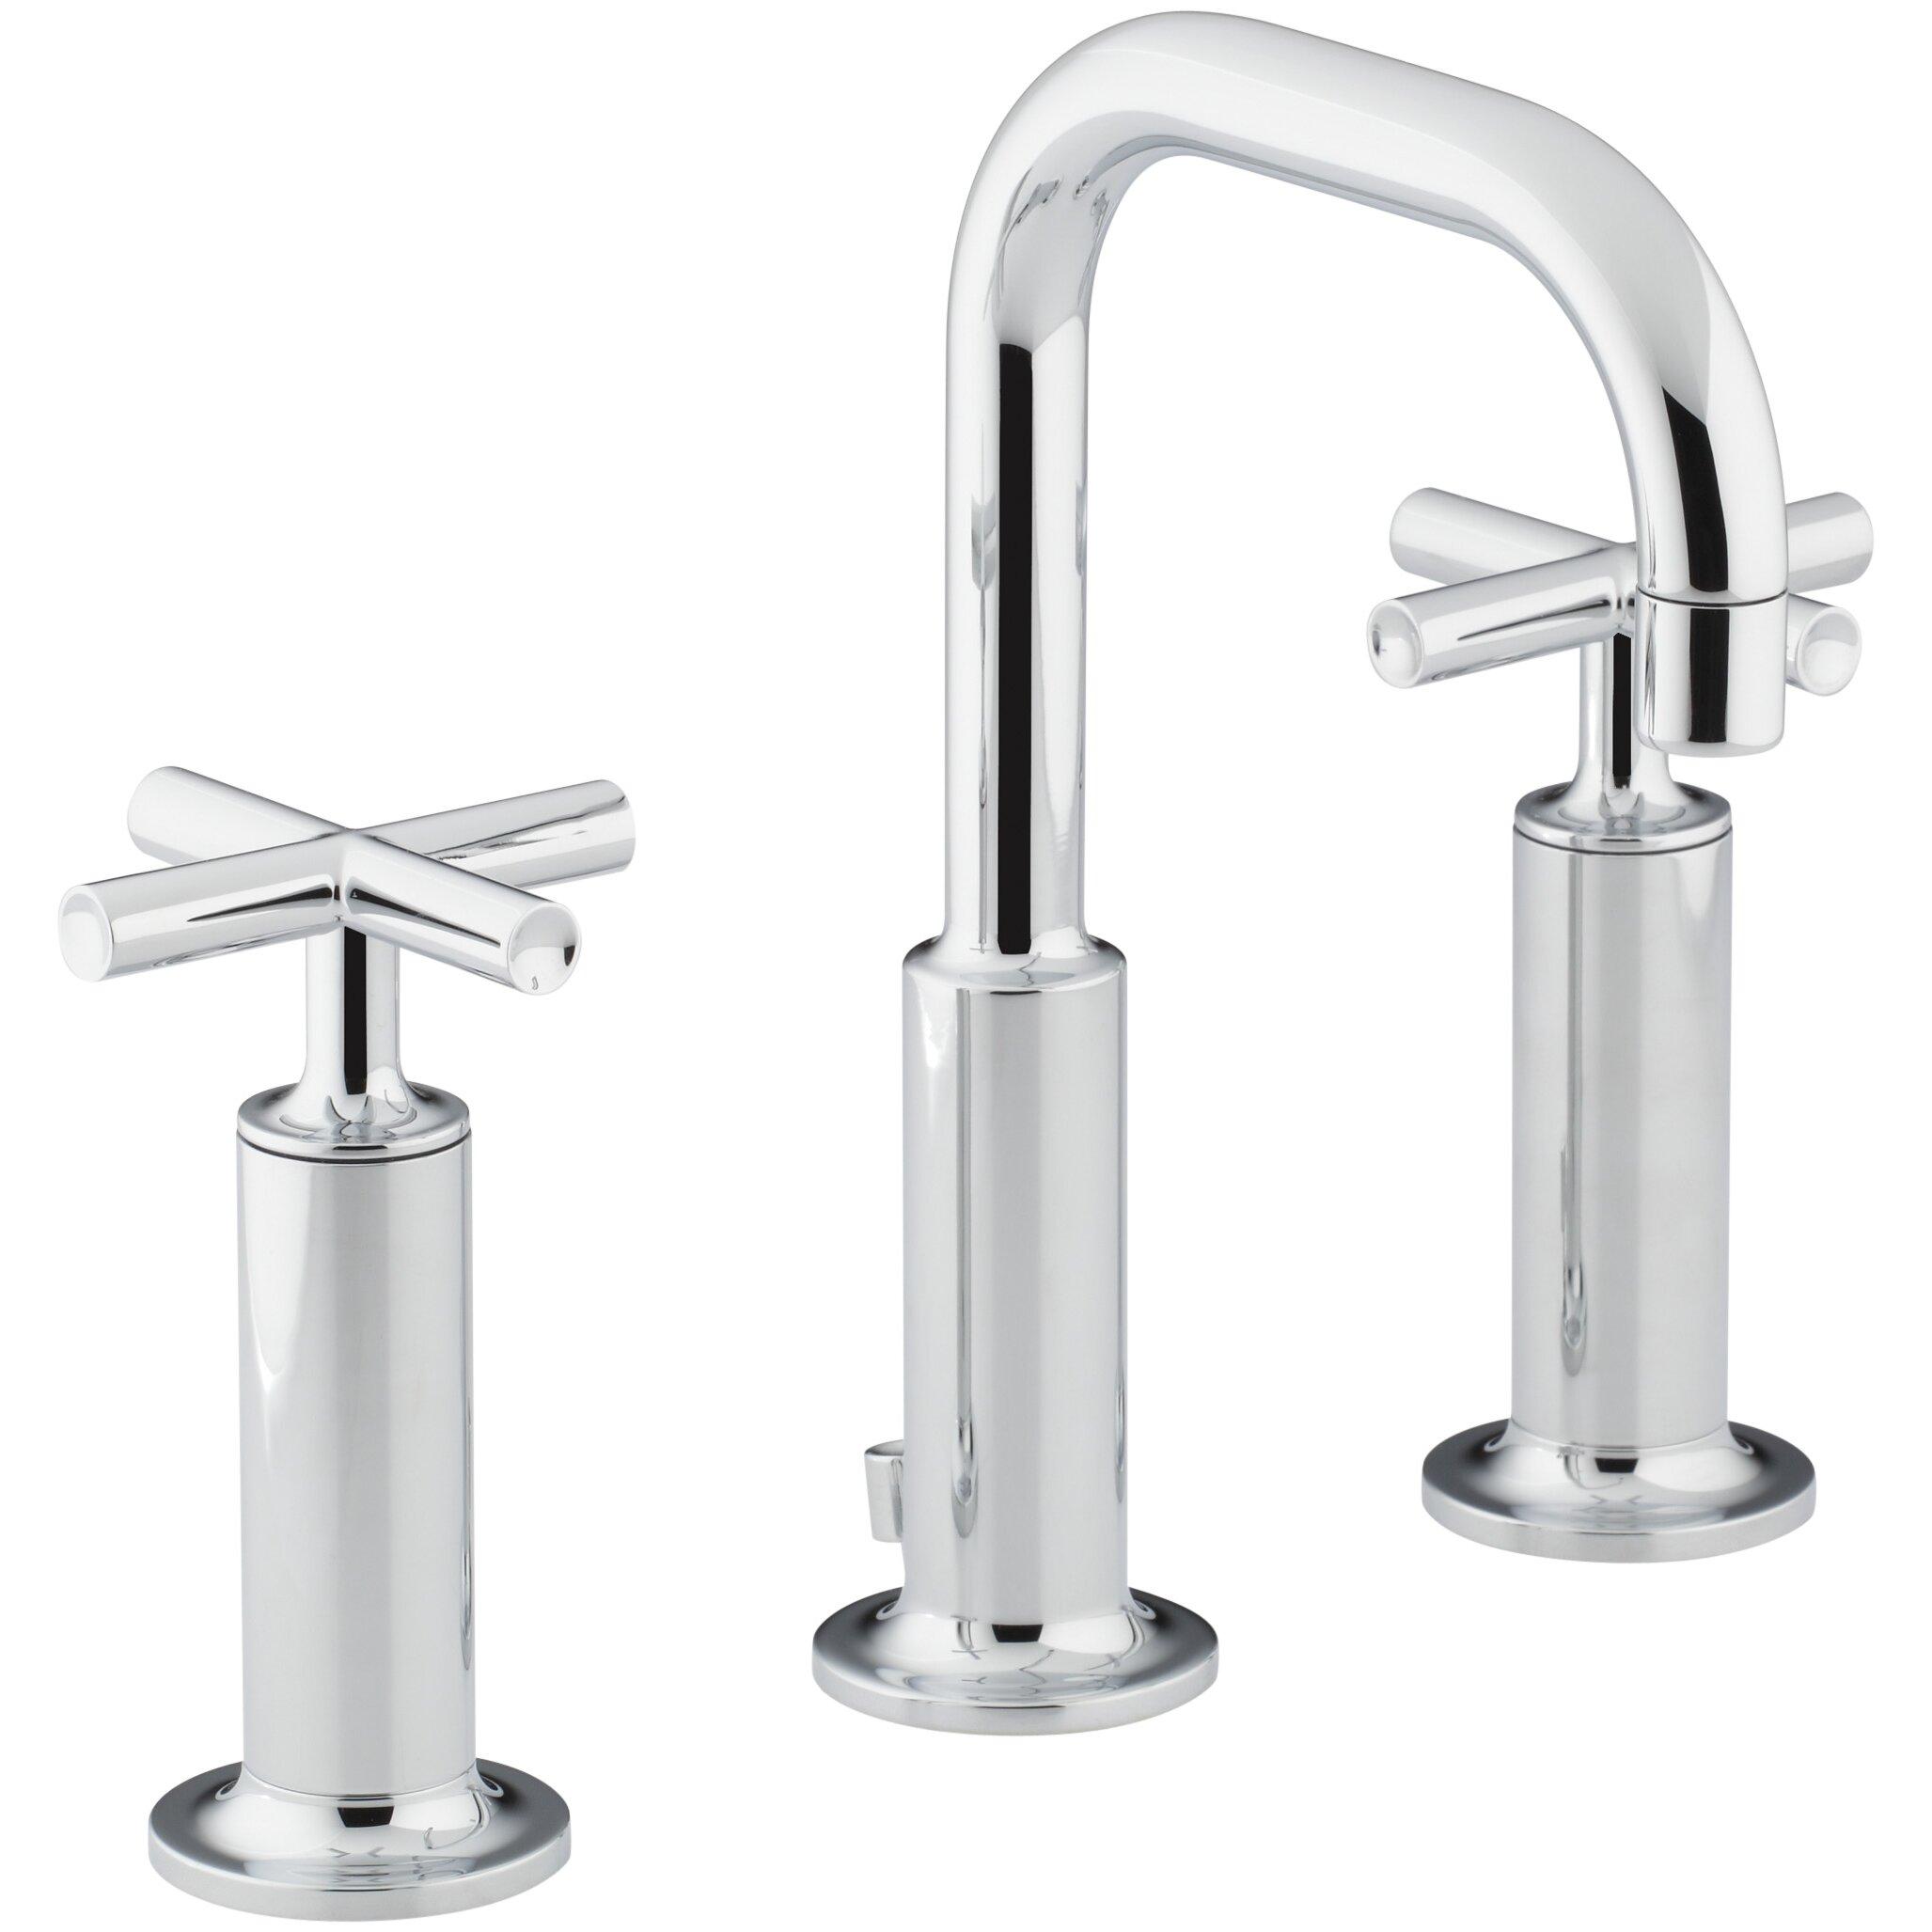 Kohler purist widespread bathroom sink faucet with high for Kohler bathroom sink faucets widespread